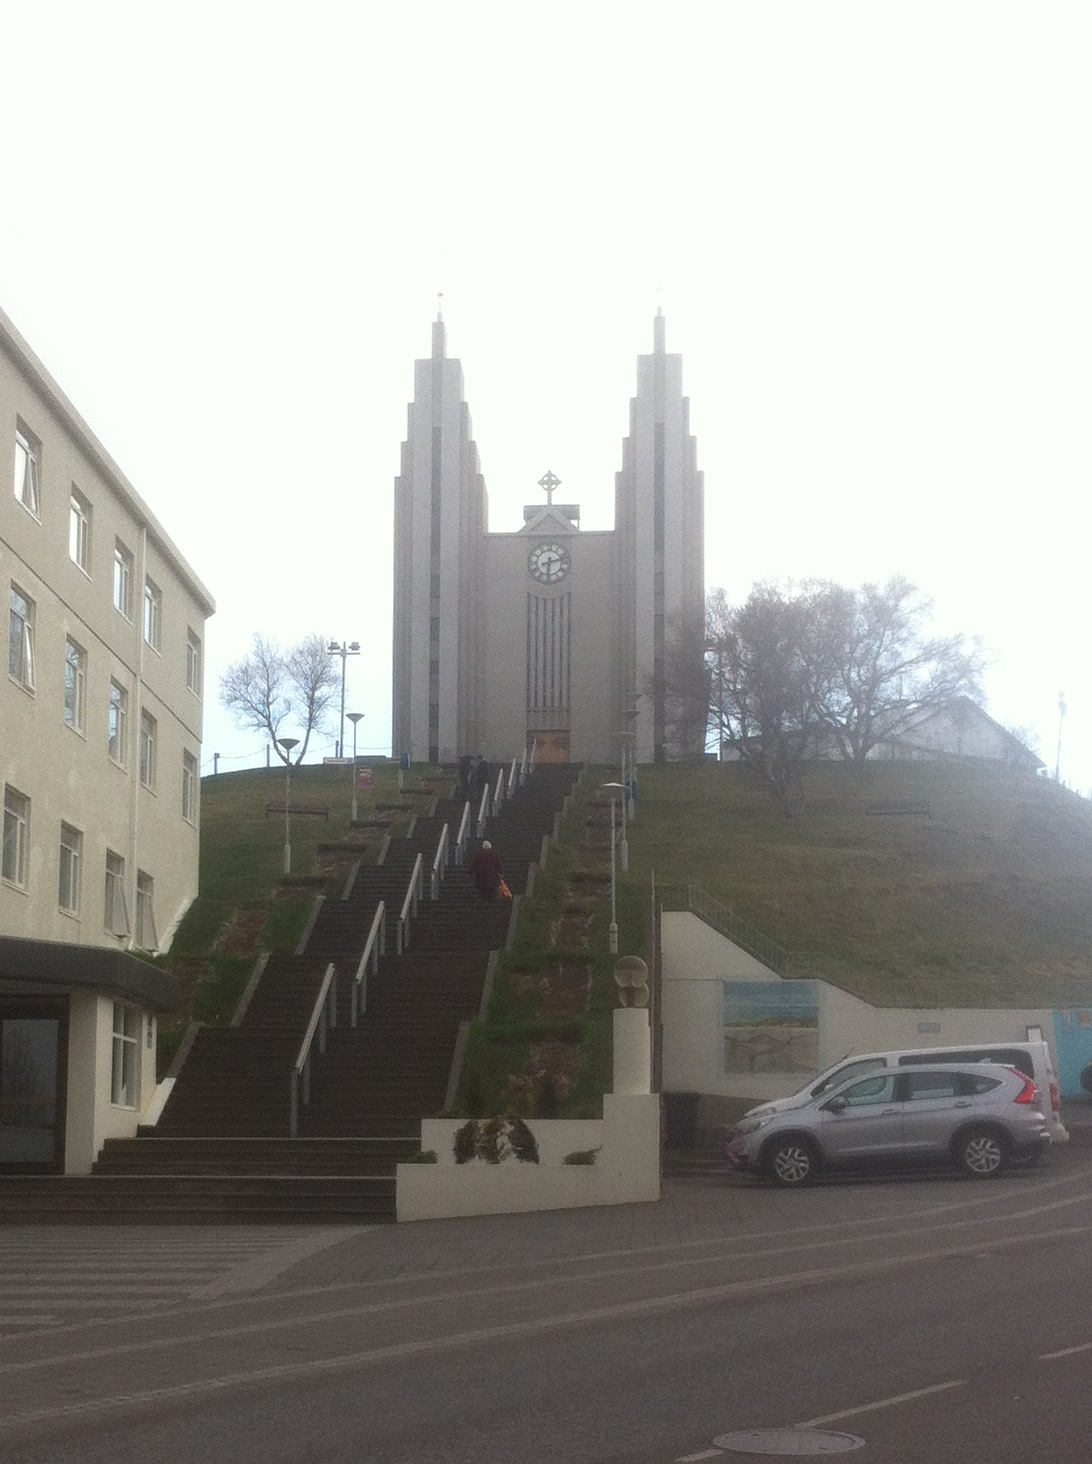 Akureyrarkirkja Lutheran Church, Akureyri Iceland